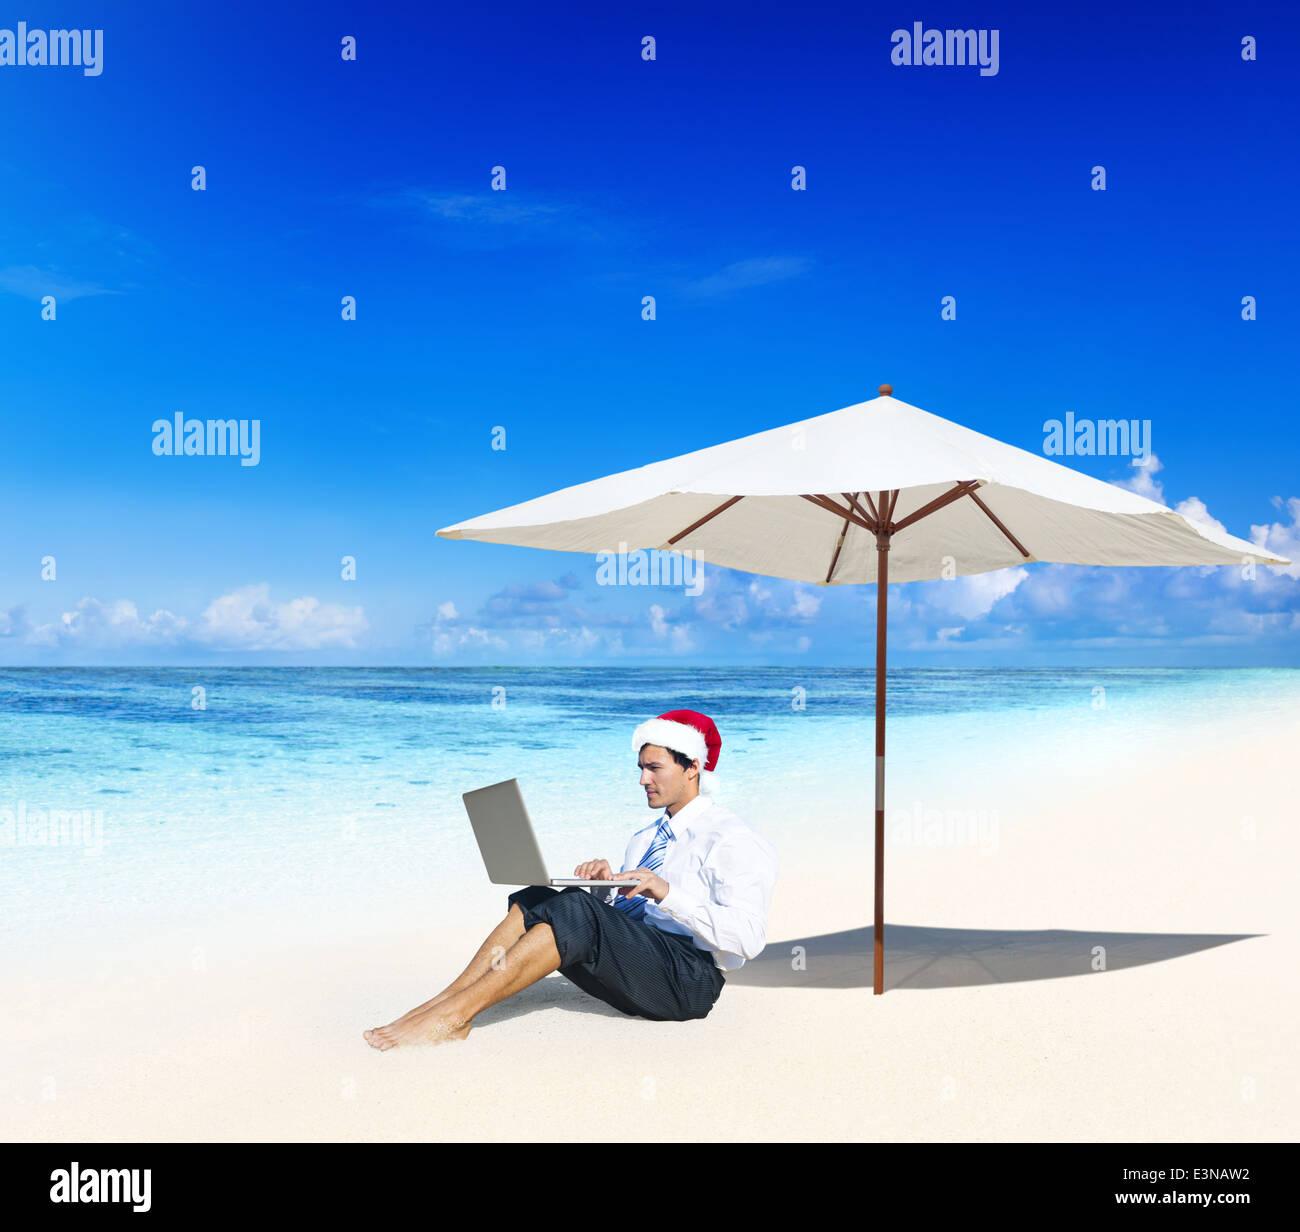 Laptop Beach Wallpaper Photos Laptop Beach Wallpaper Images Alamy